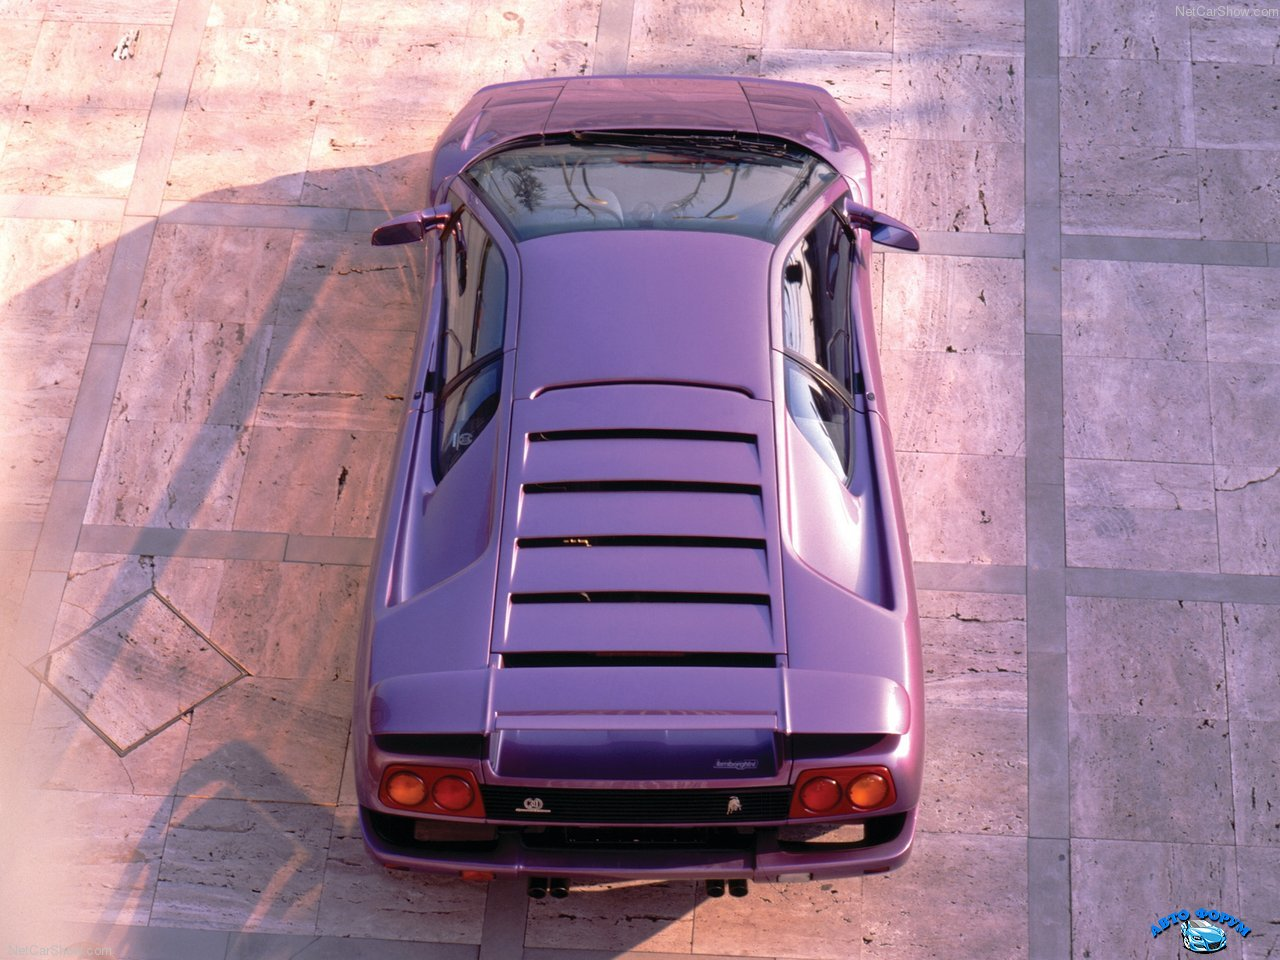 Lamborghini-Diablo_SE_1994_1280x960_wallpaper_05.jpg